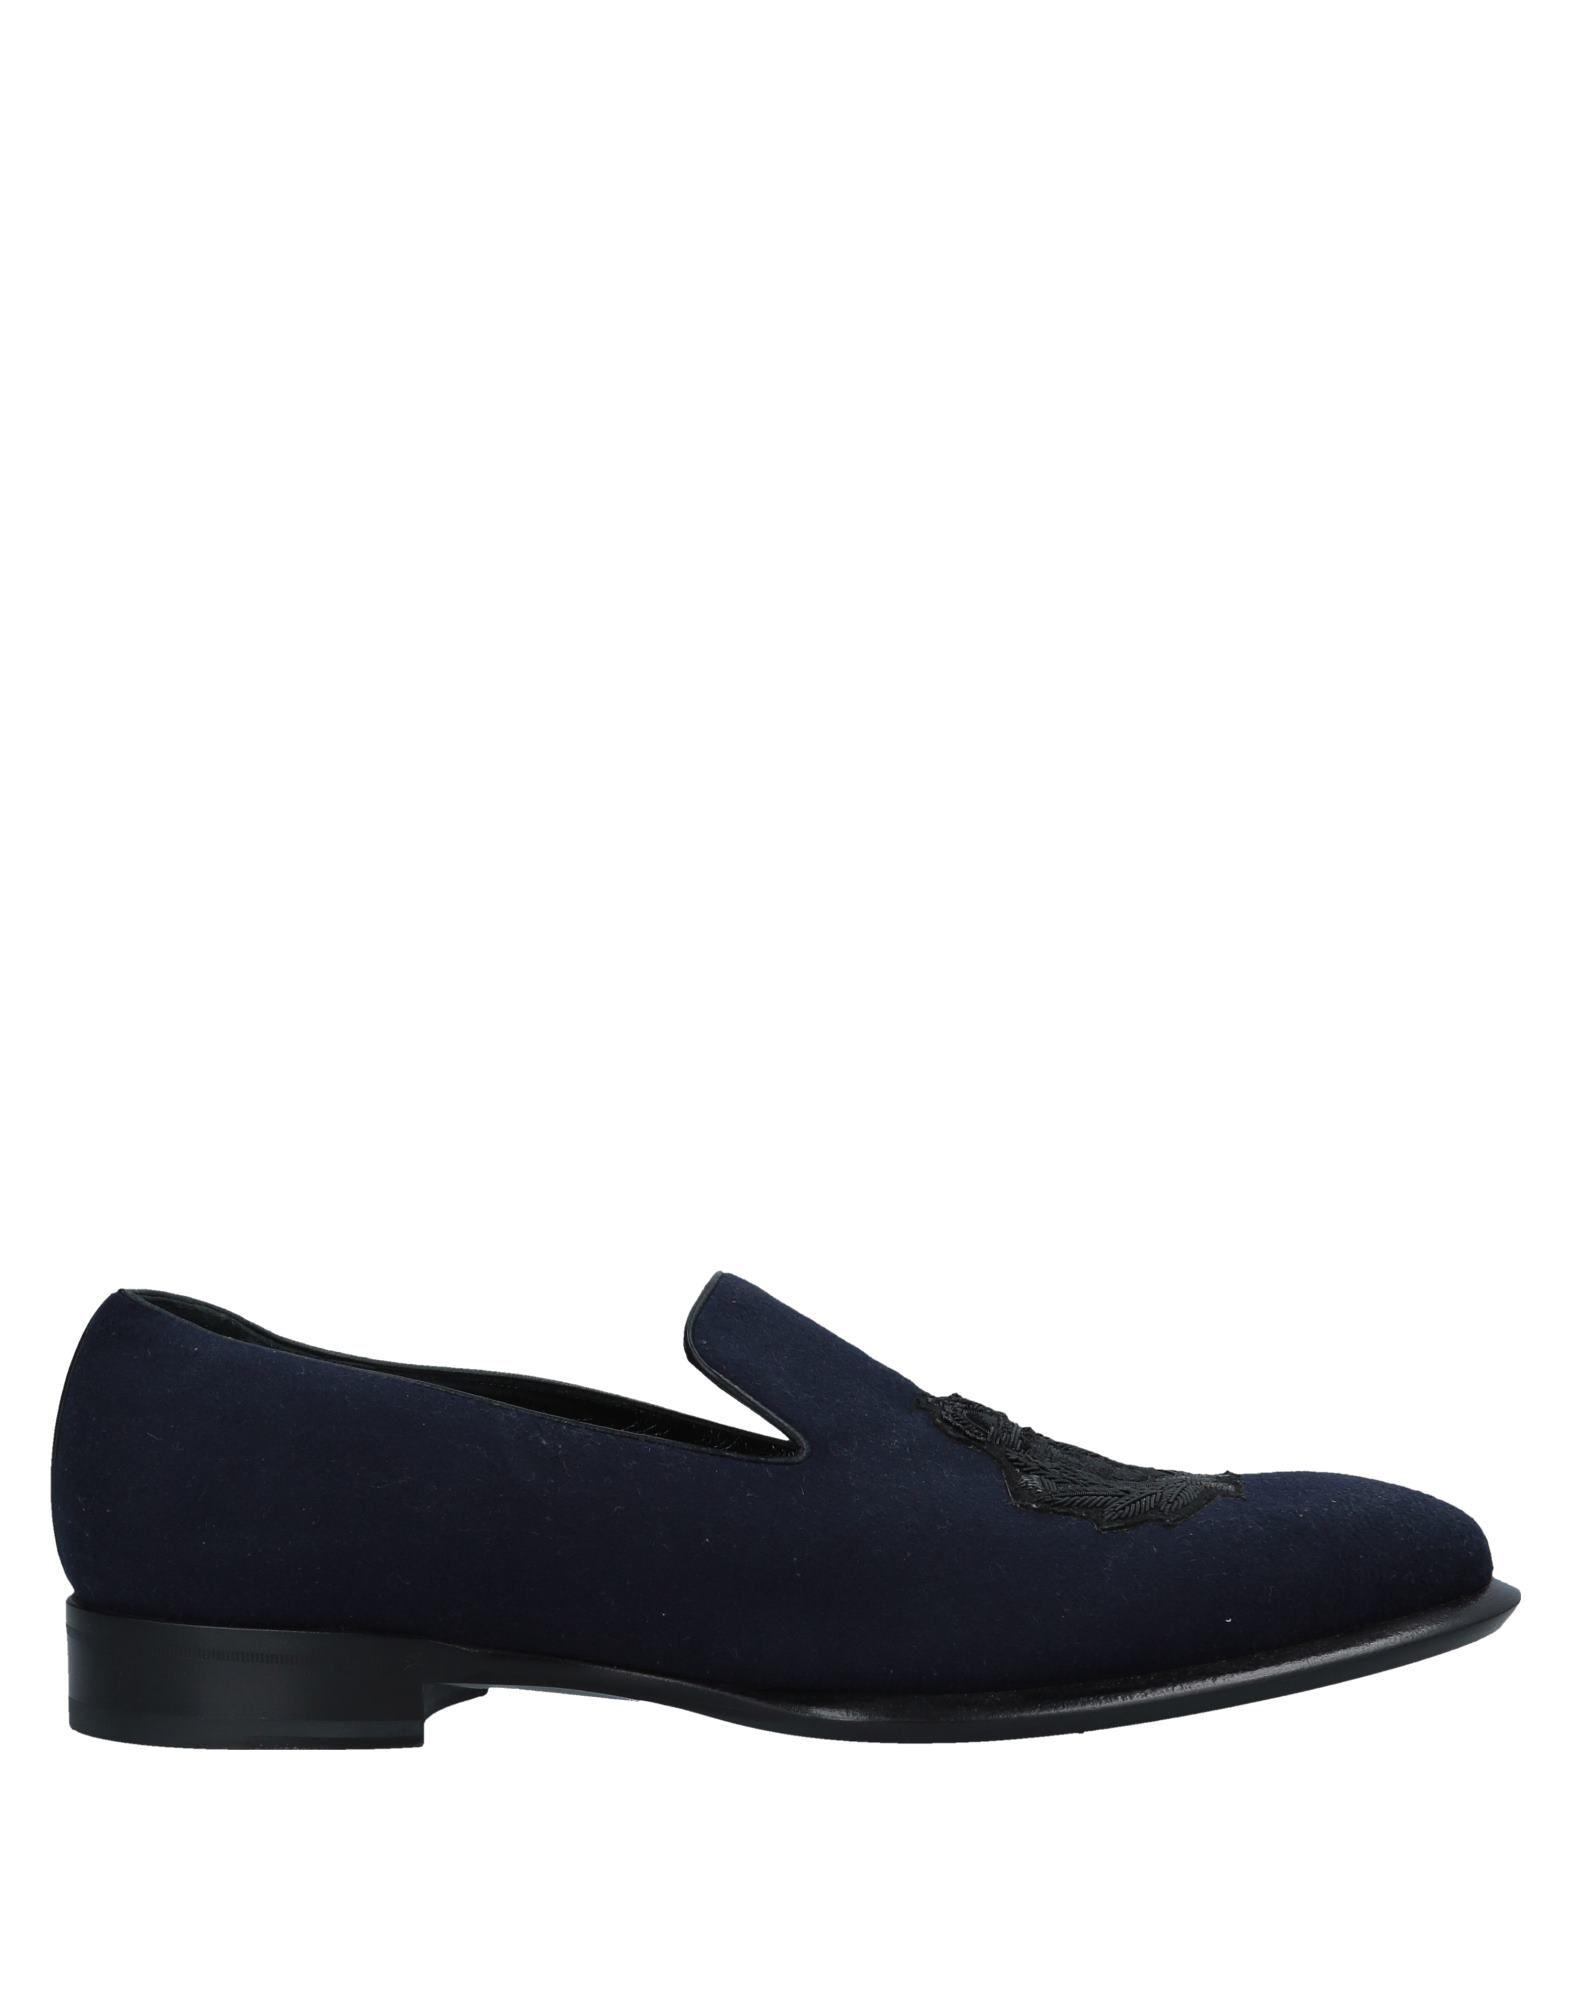 3b6c335b15f Lyst - Alexander Mcqueen Loafer in Blue for Men